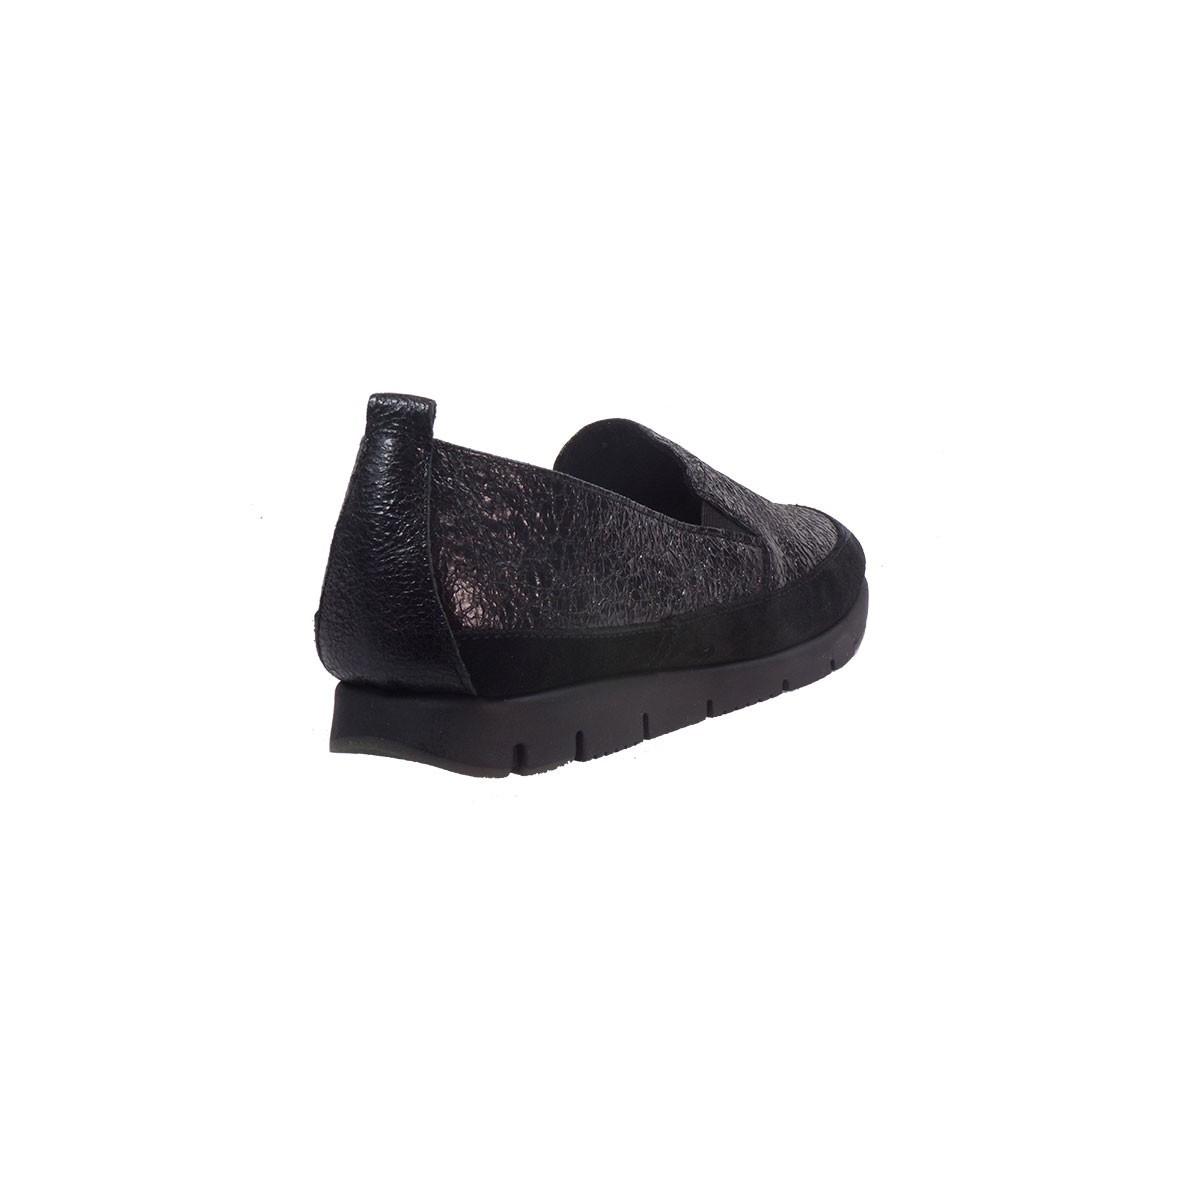 831abadfbb6 Aerosoles Shoes Γυναικεία Παπούτσια FAST LANE 868270694 Mαύρο Δέρμα ...